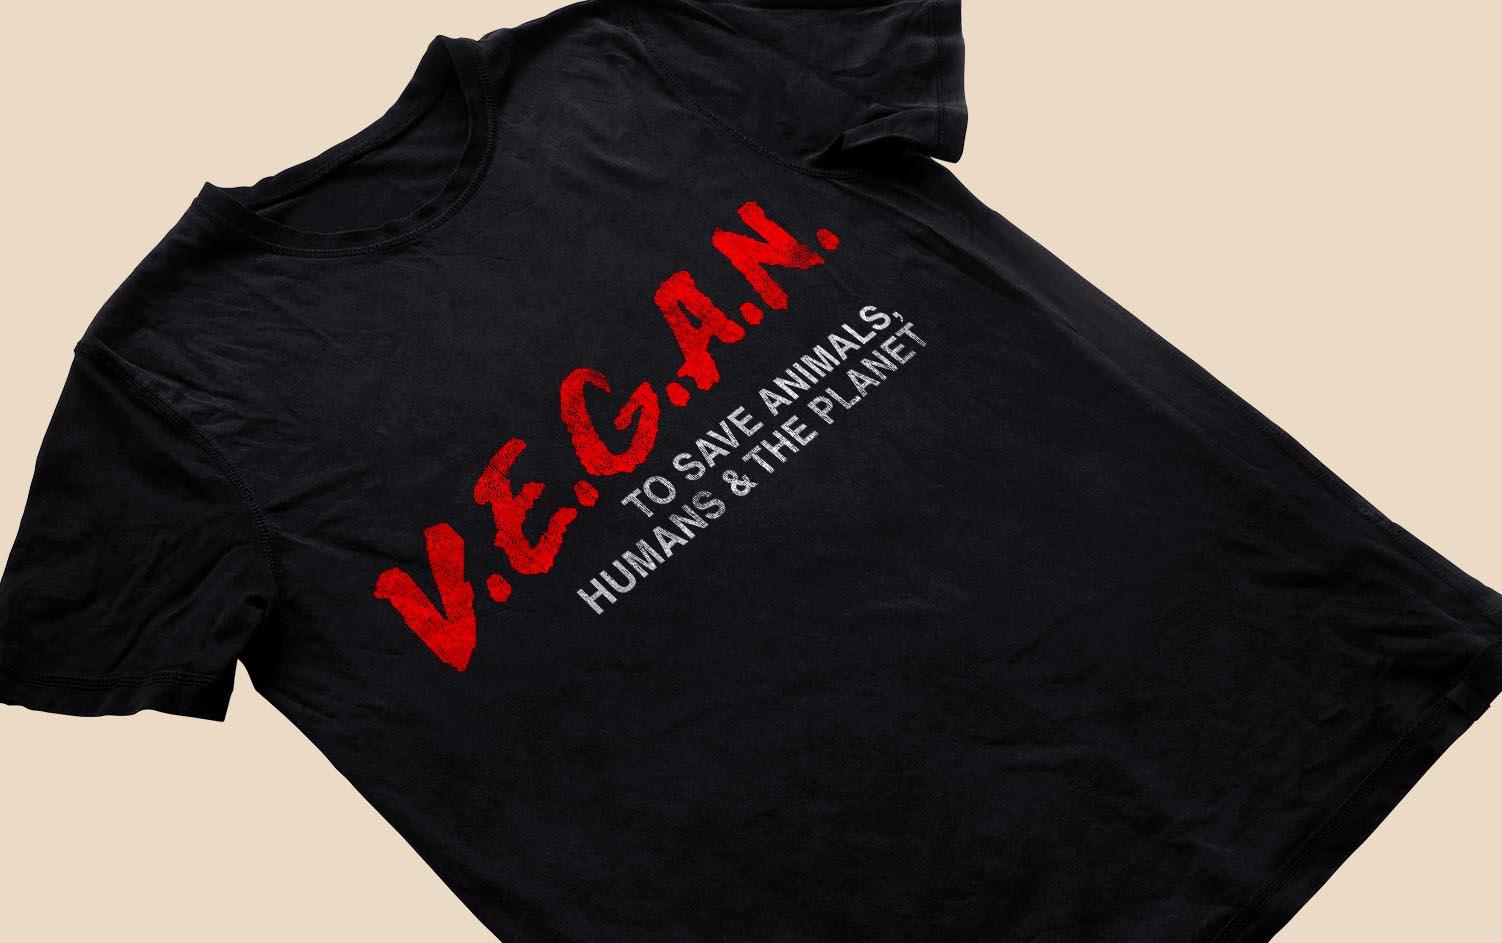 t-shirt-mockup-vegan1.jpg